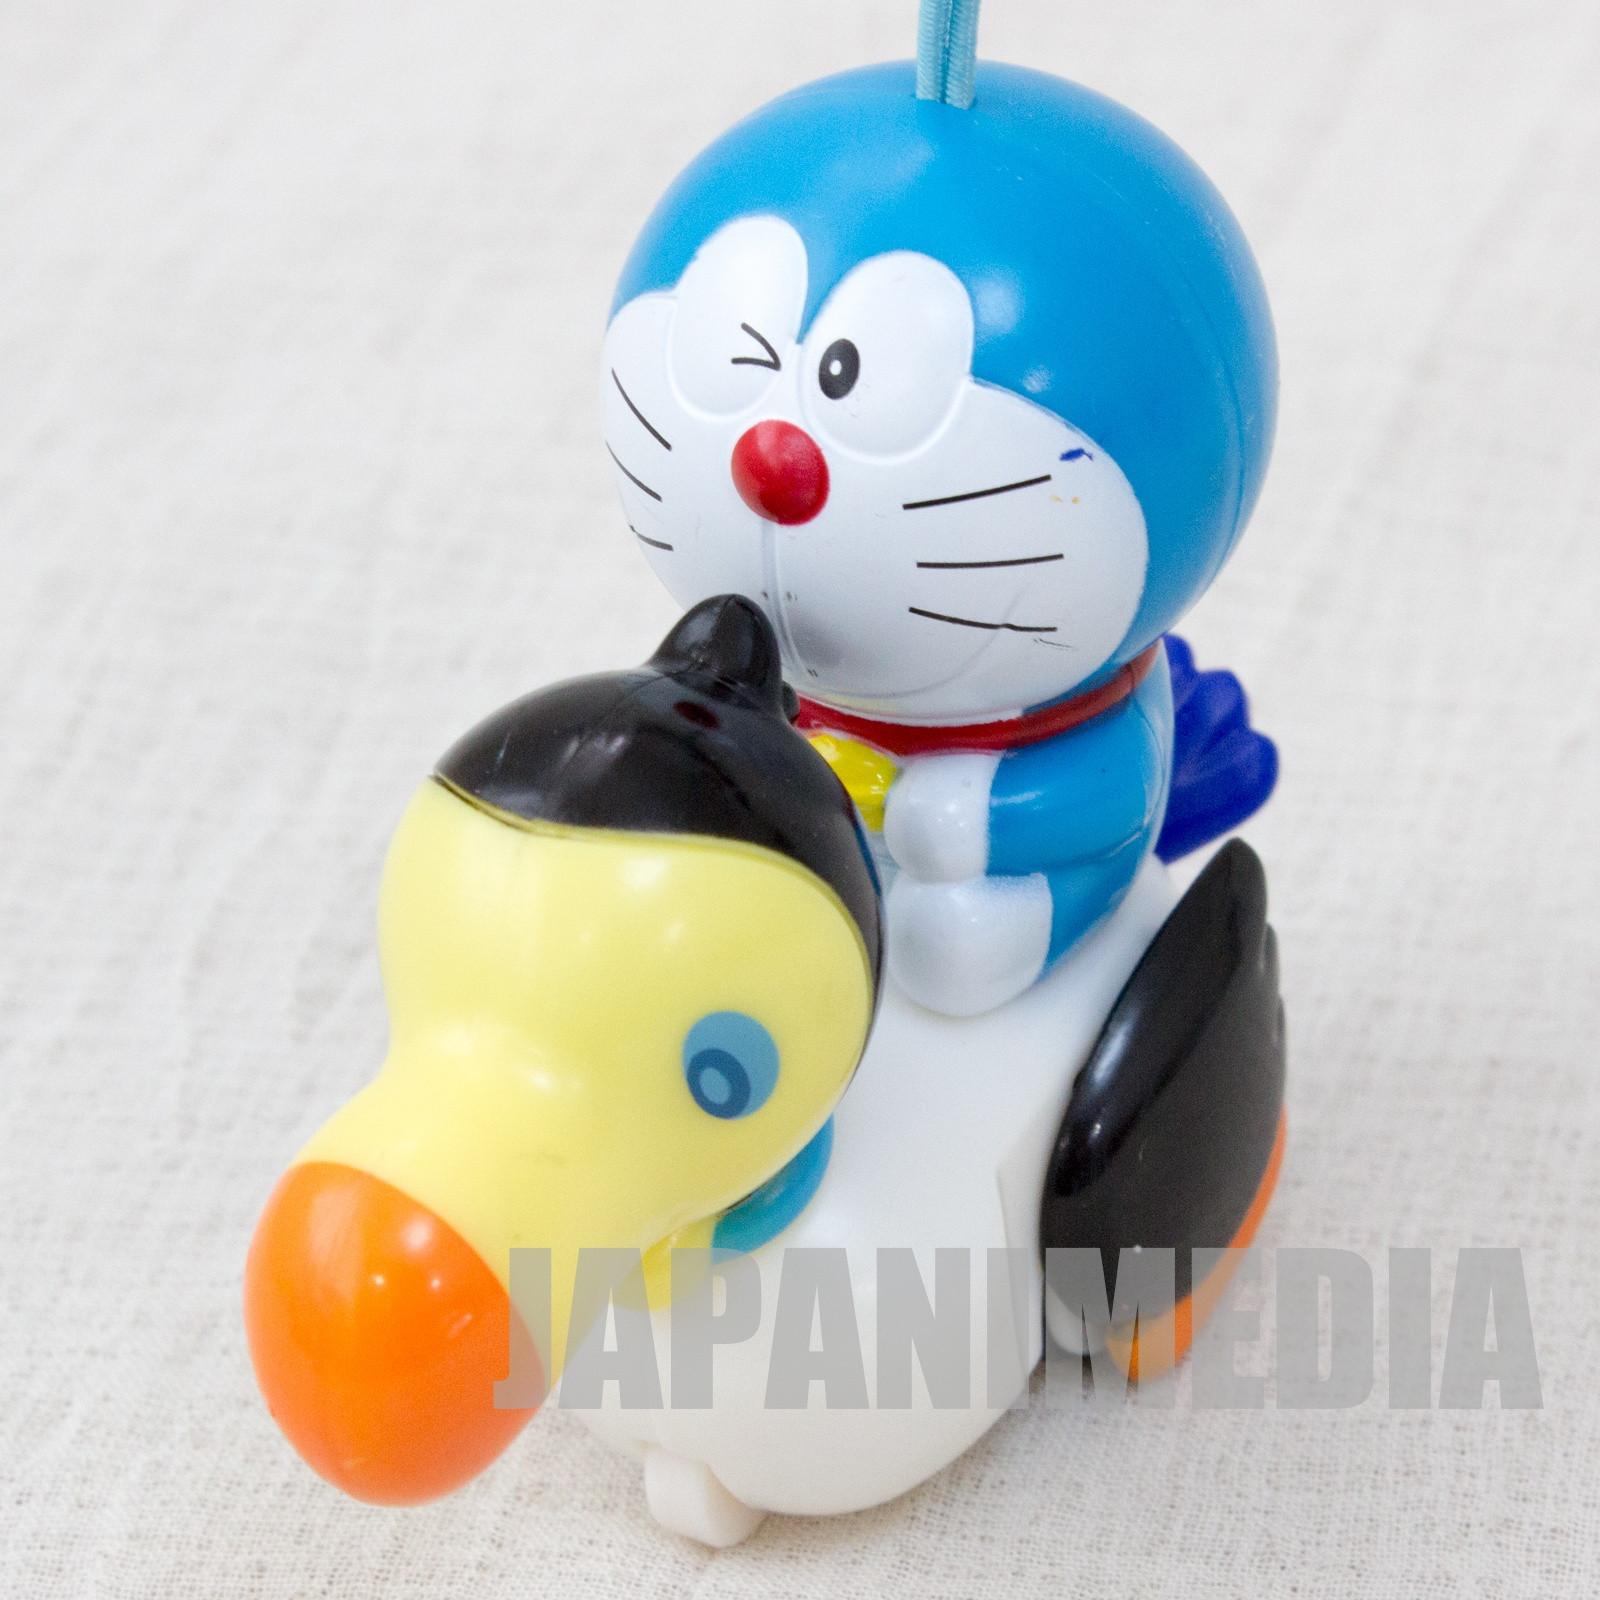 Doraemon: Nobita and the Island of Miracles ~Animal Adventure~ Doraemon & Kurajo Pull Back Figure JAPAN ANIME